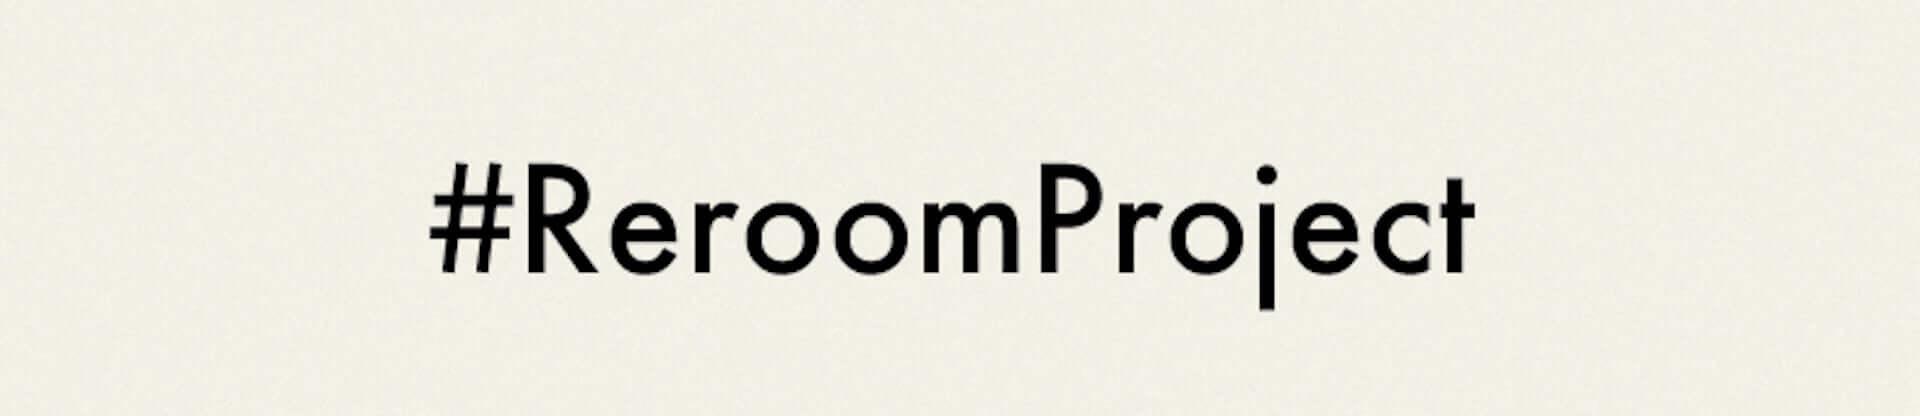 Clubhouseでの共同制作で話題のTAAR & ANIMAL HACKがリミックス募集プロジェクト「#ReroomProject」を発足!ステム&オケデータが公開 music210212_reroomproject_4-1920x416